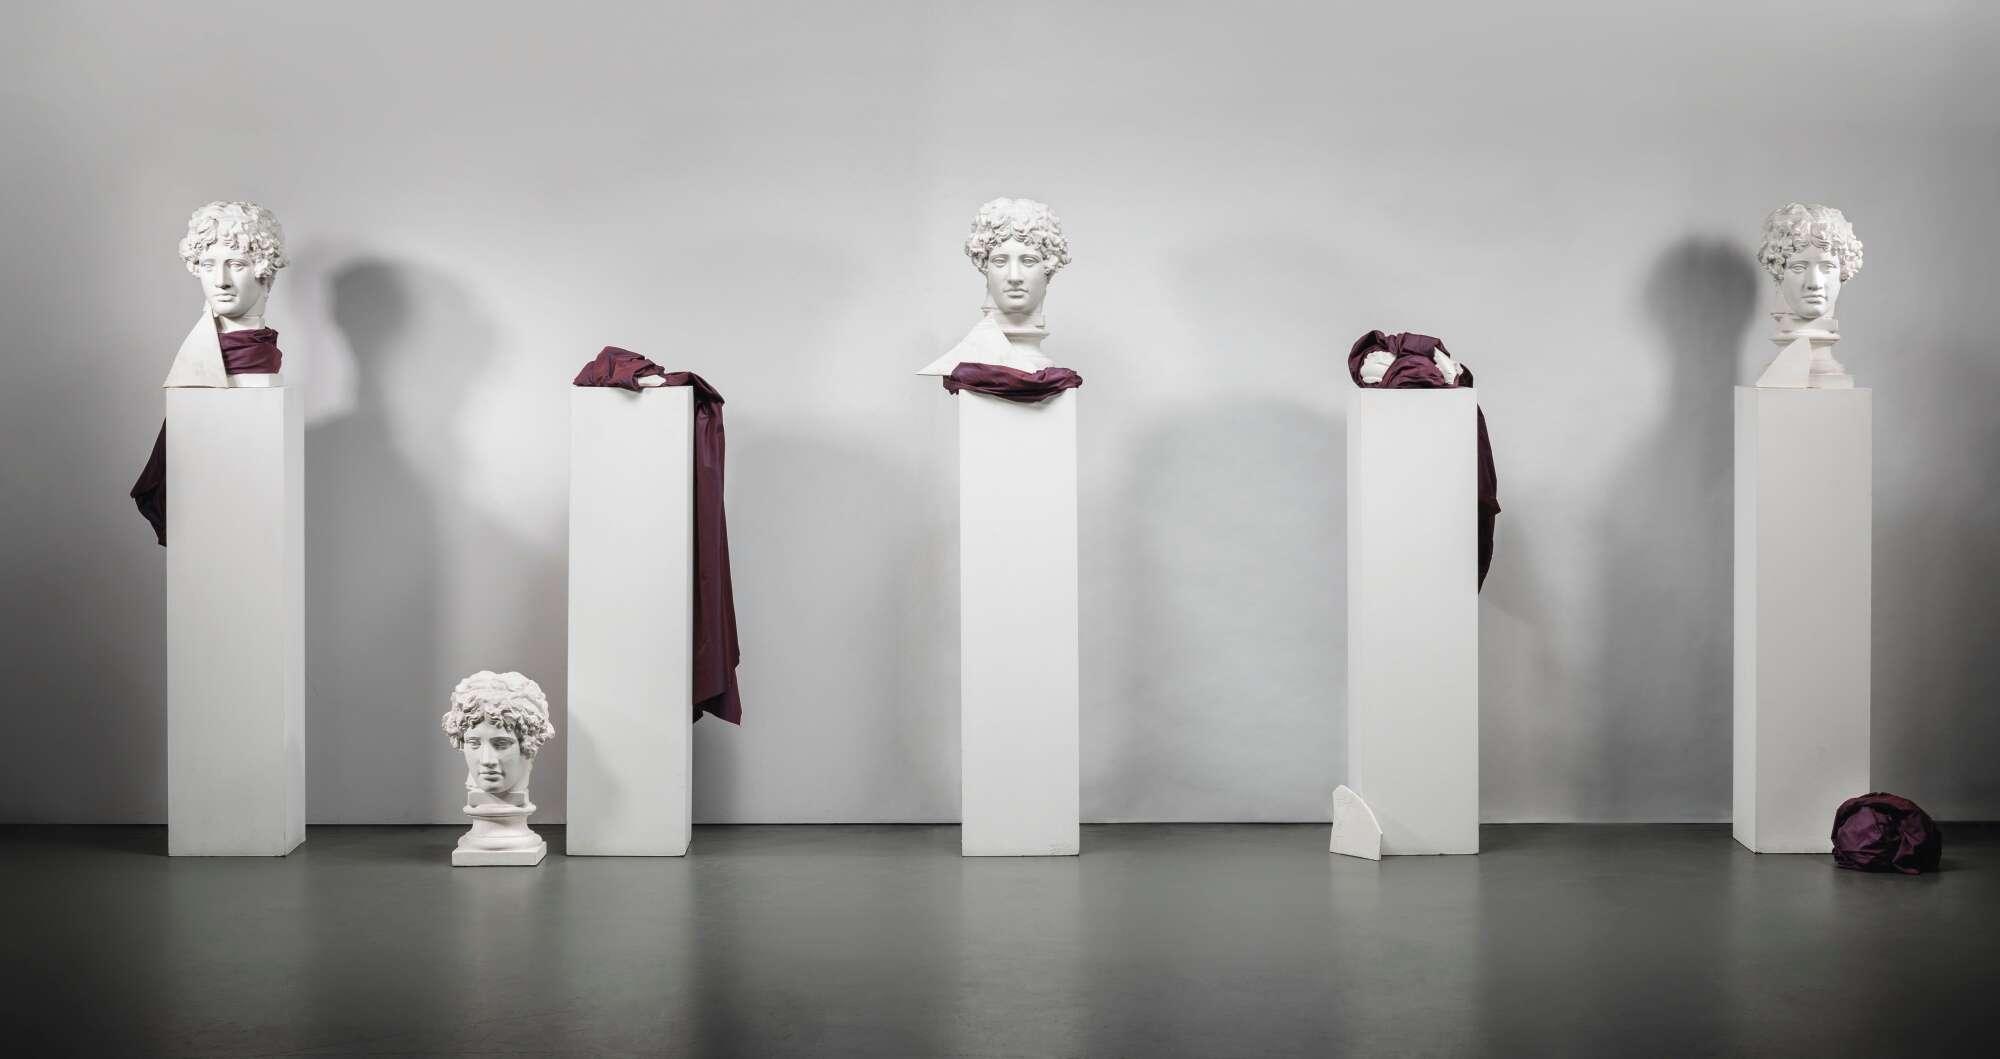 Giulio Paolini es un artista italiano que perteneció a la corriente del arte povera